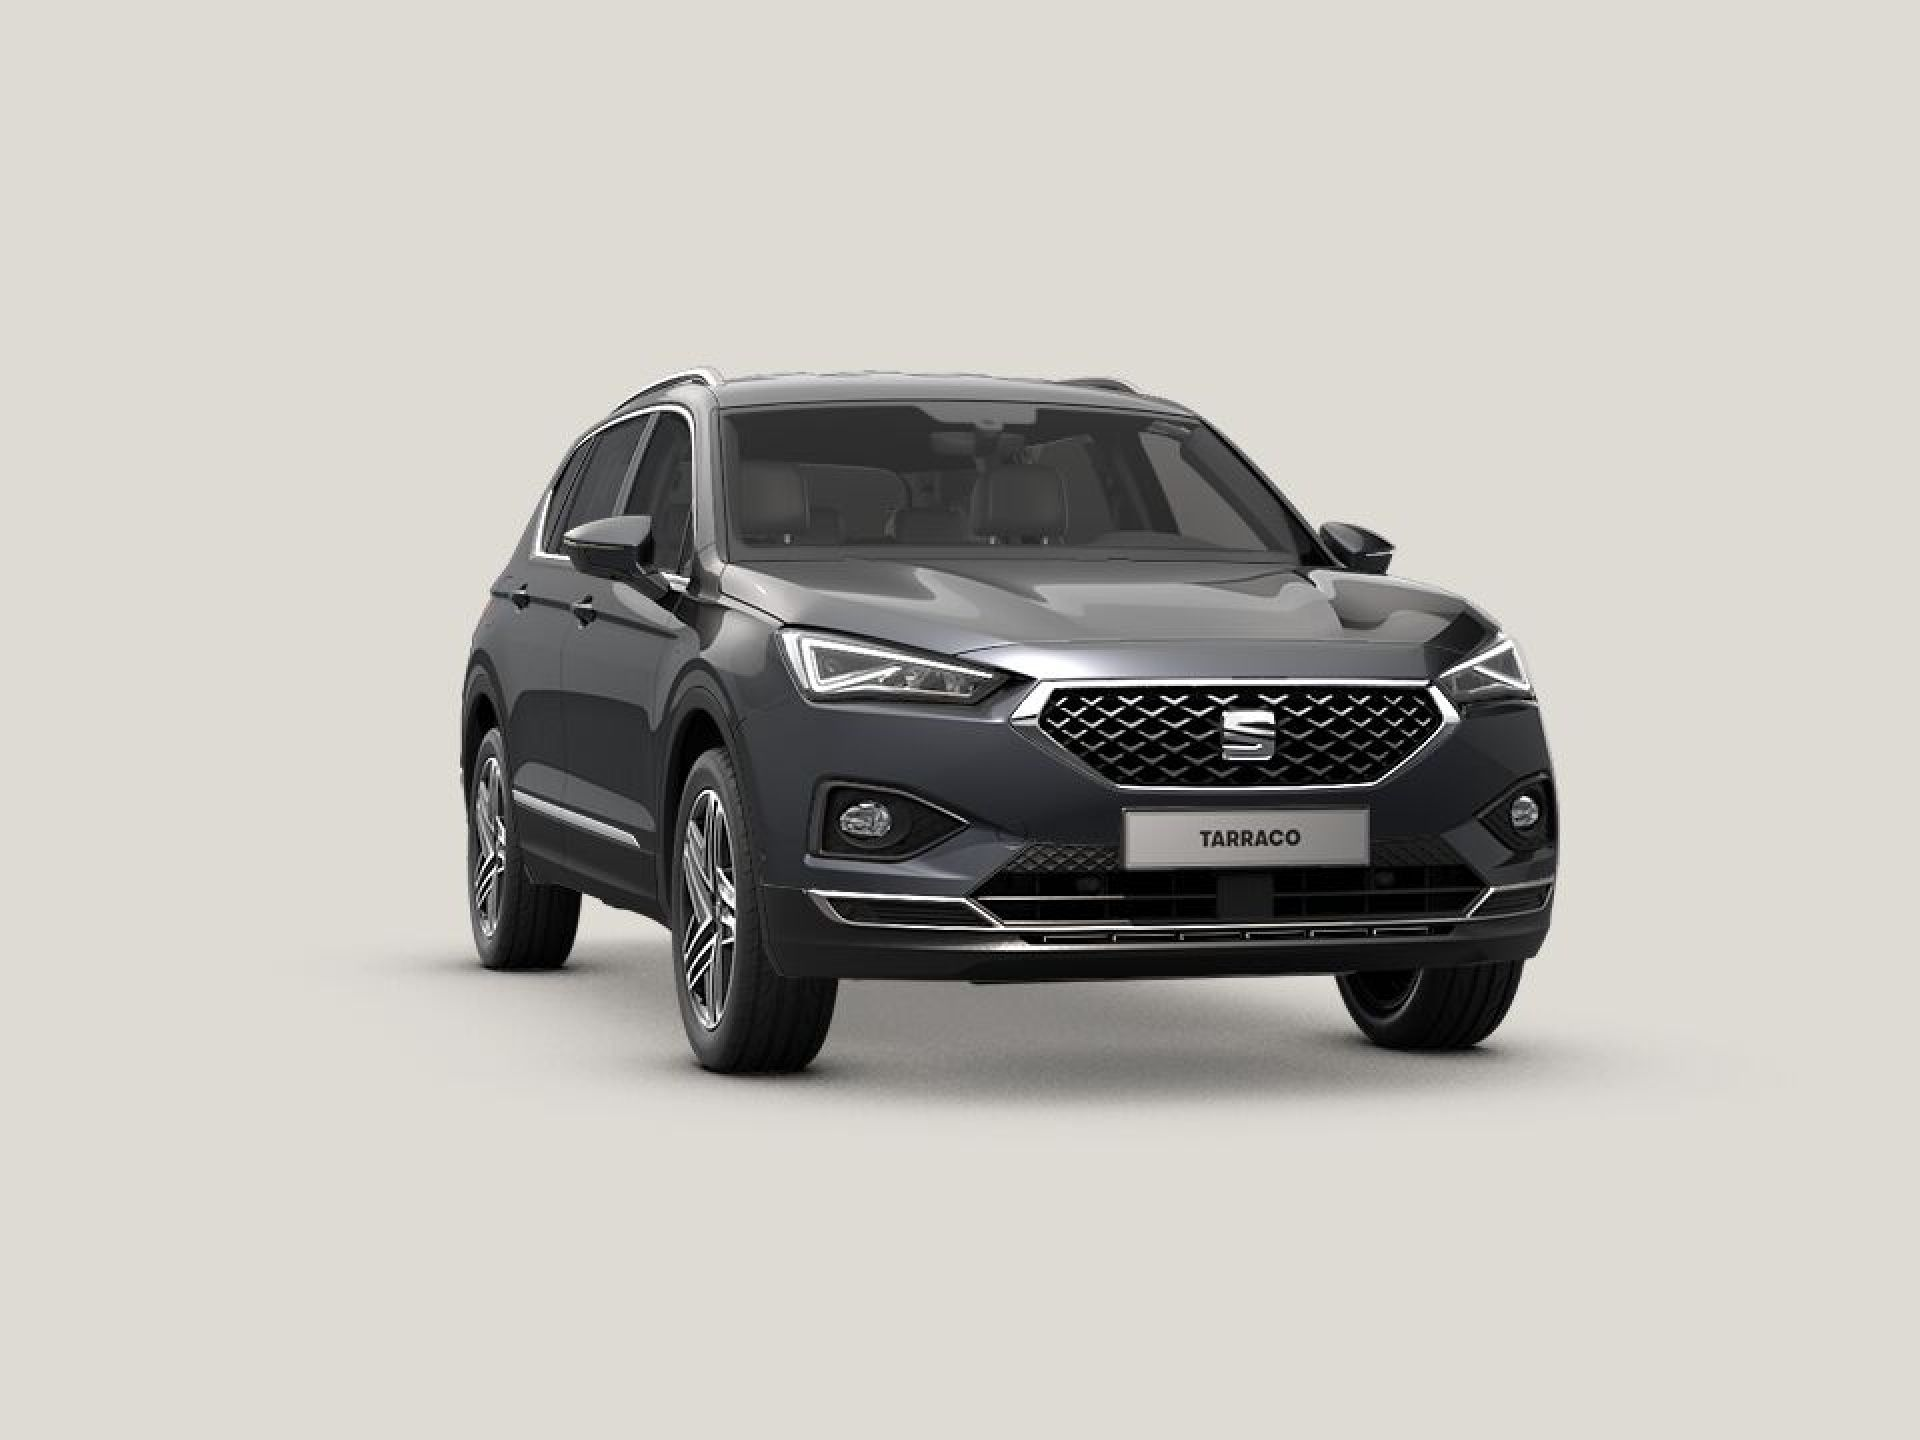 SEAT Tarraco 1.5 TSI 110kW (150CV) S&S DSG Xcellence nuevo Madrid